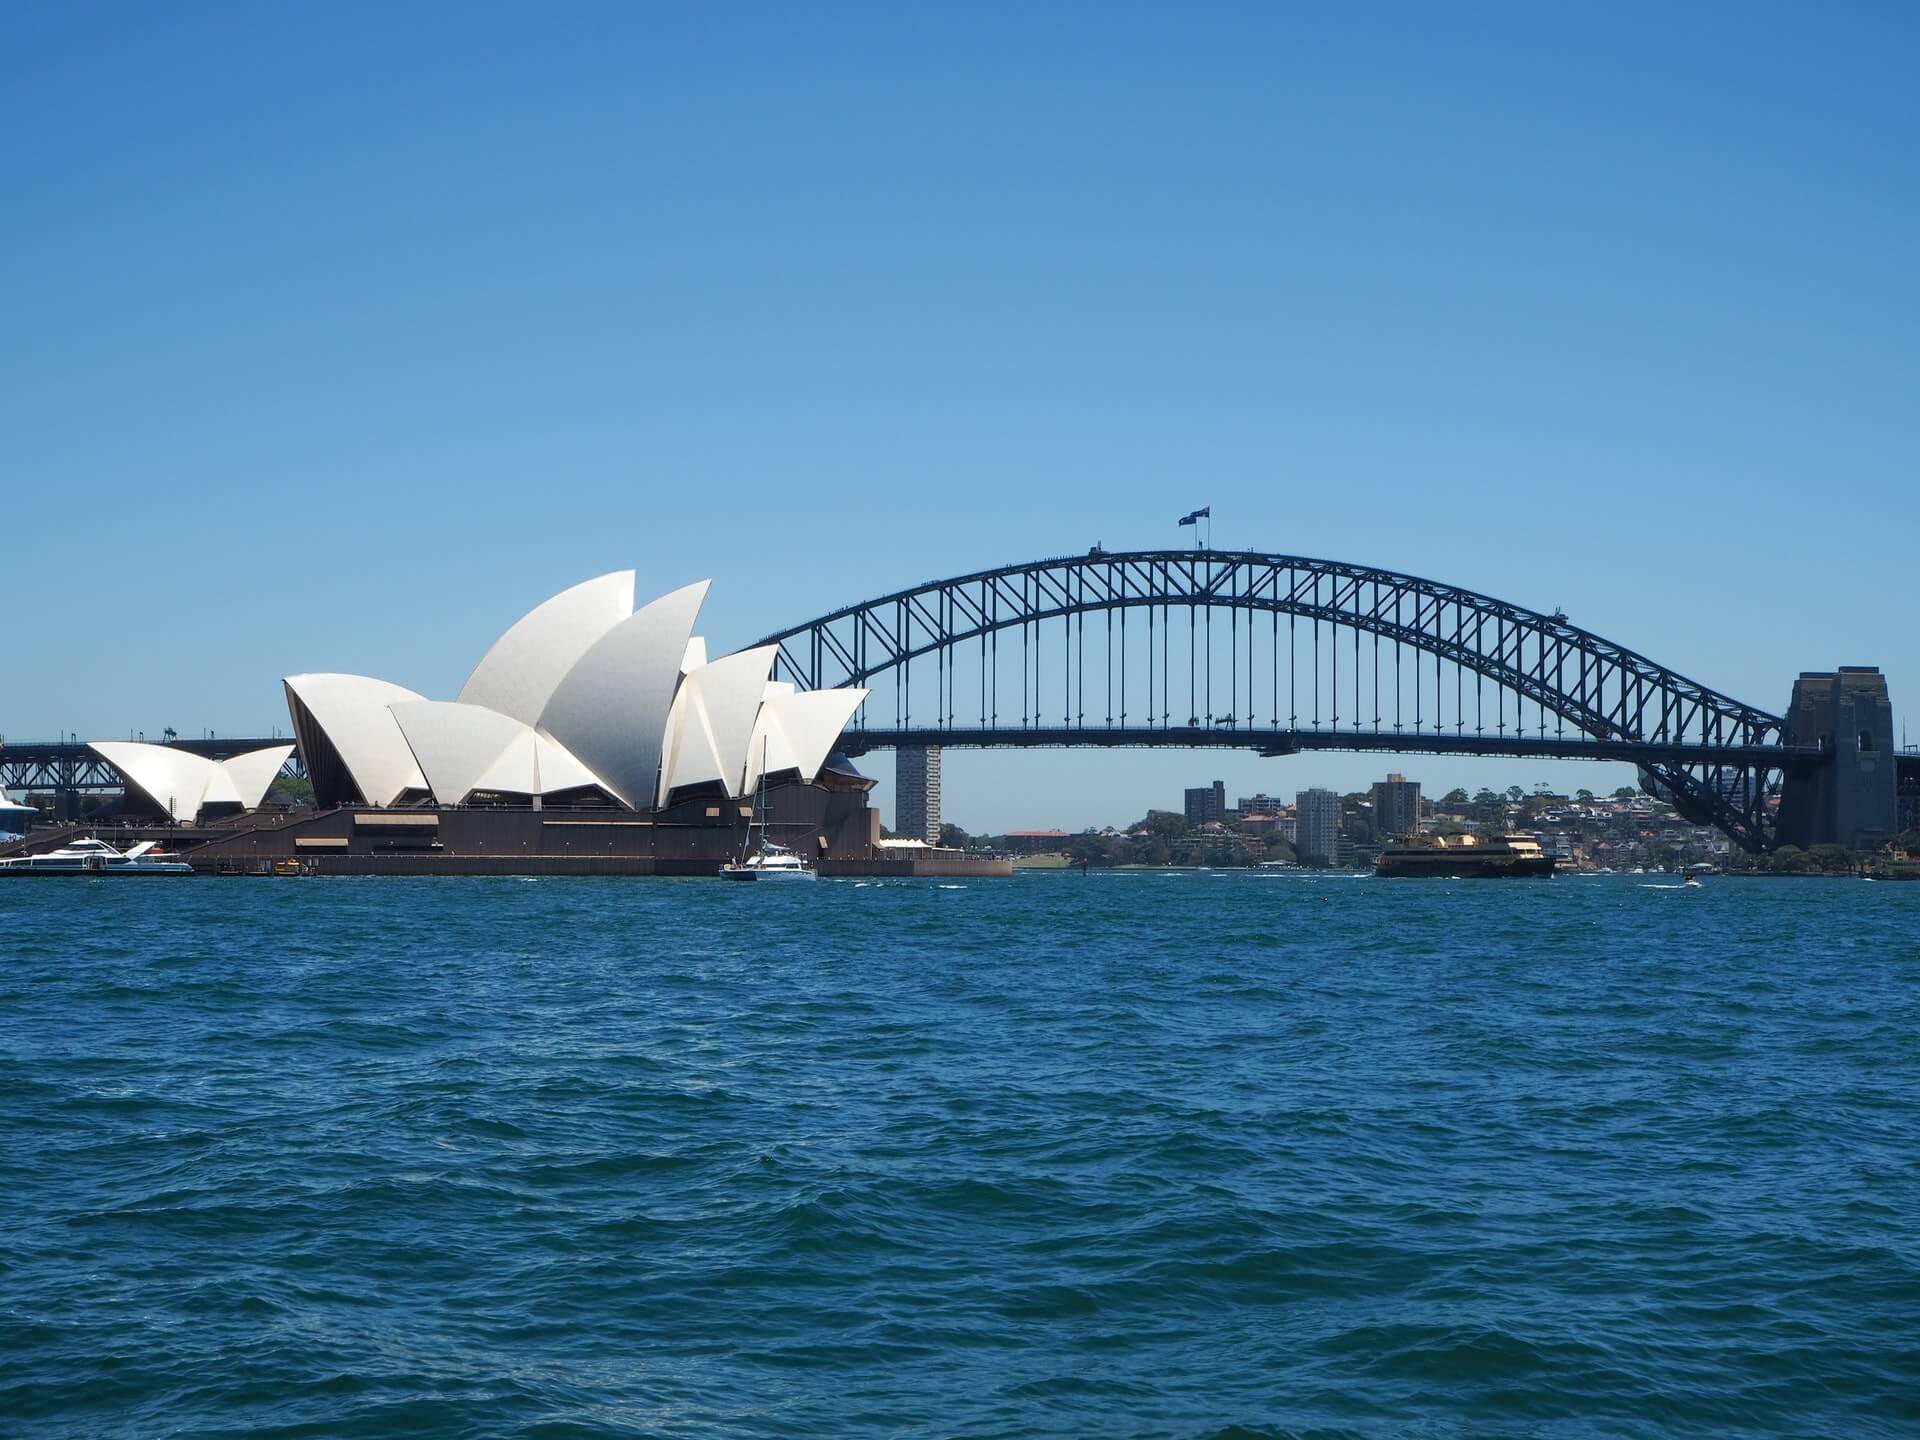 Australian bridging visas registered migration agents immigration lawyers sydney balmain brisbane queensland new south wales